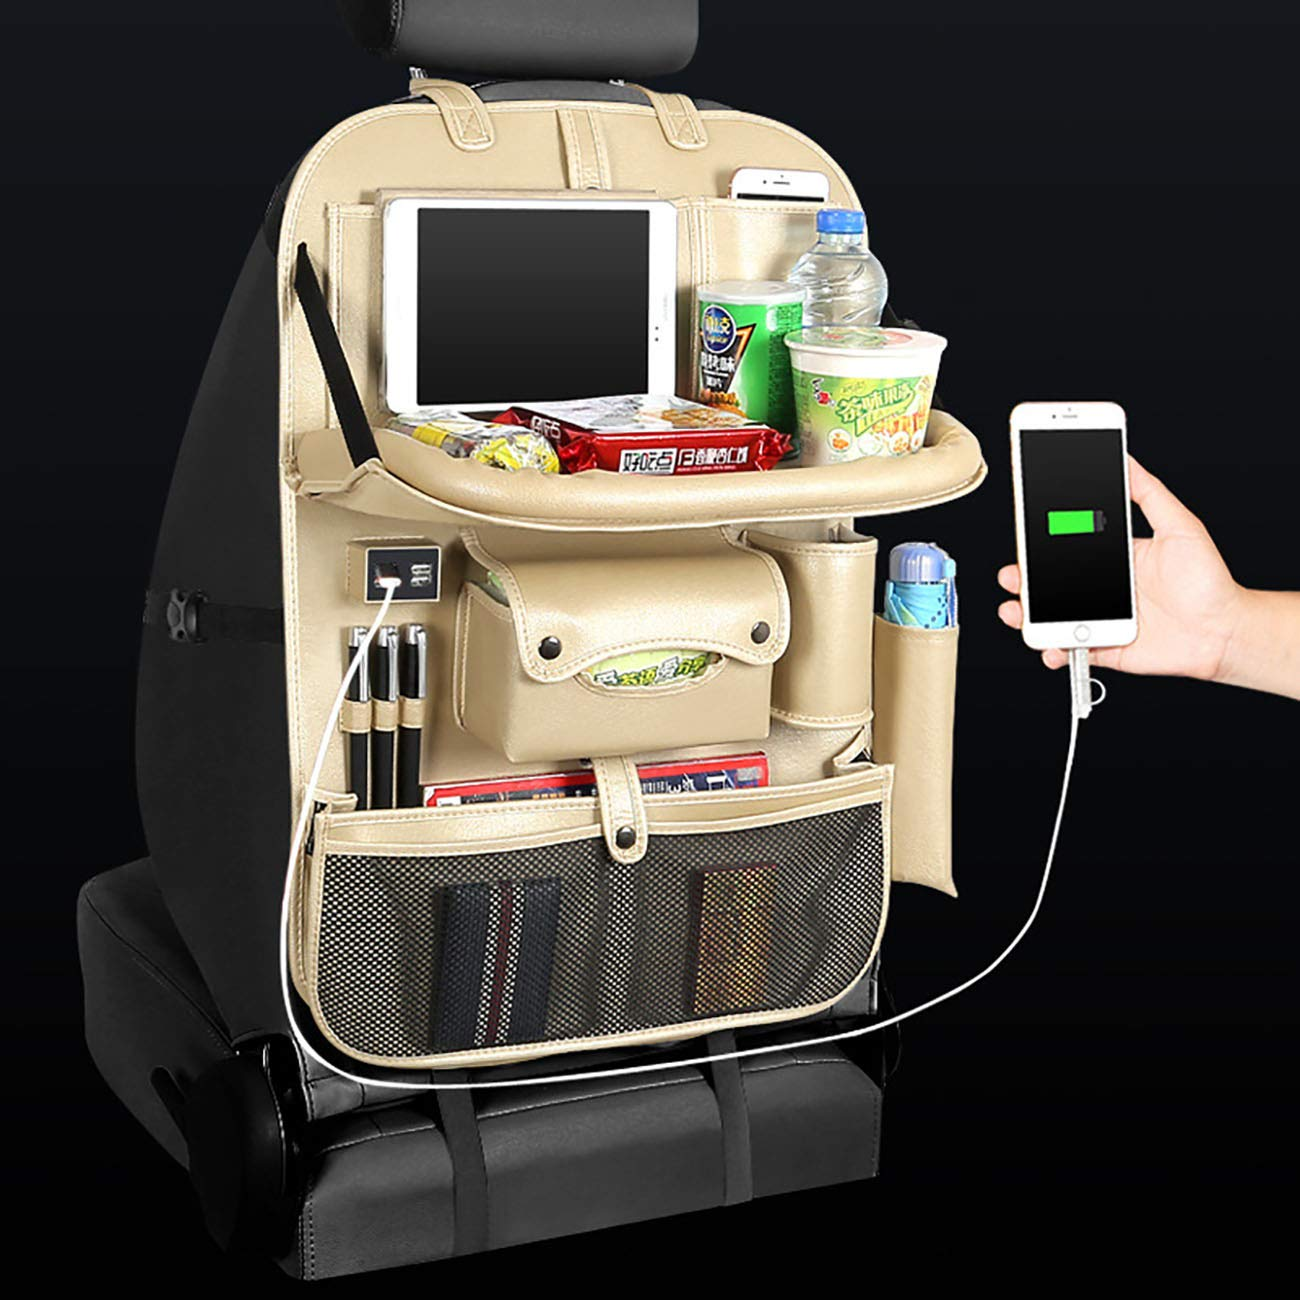 Car Back Seat Brown Organizer ipad Tablet Holder Storage Kick Mats Kids Tidy